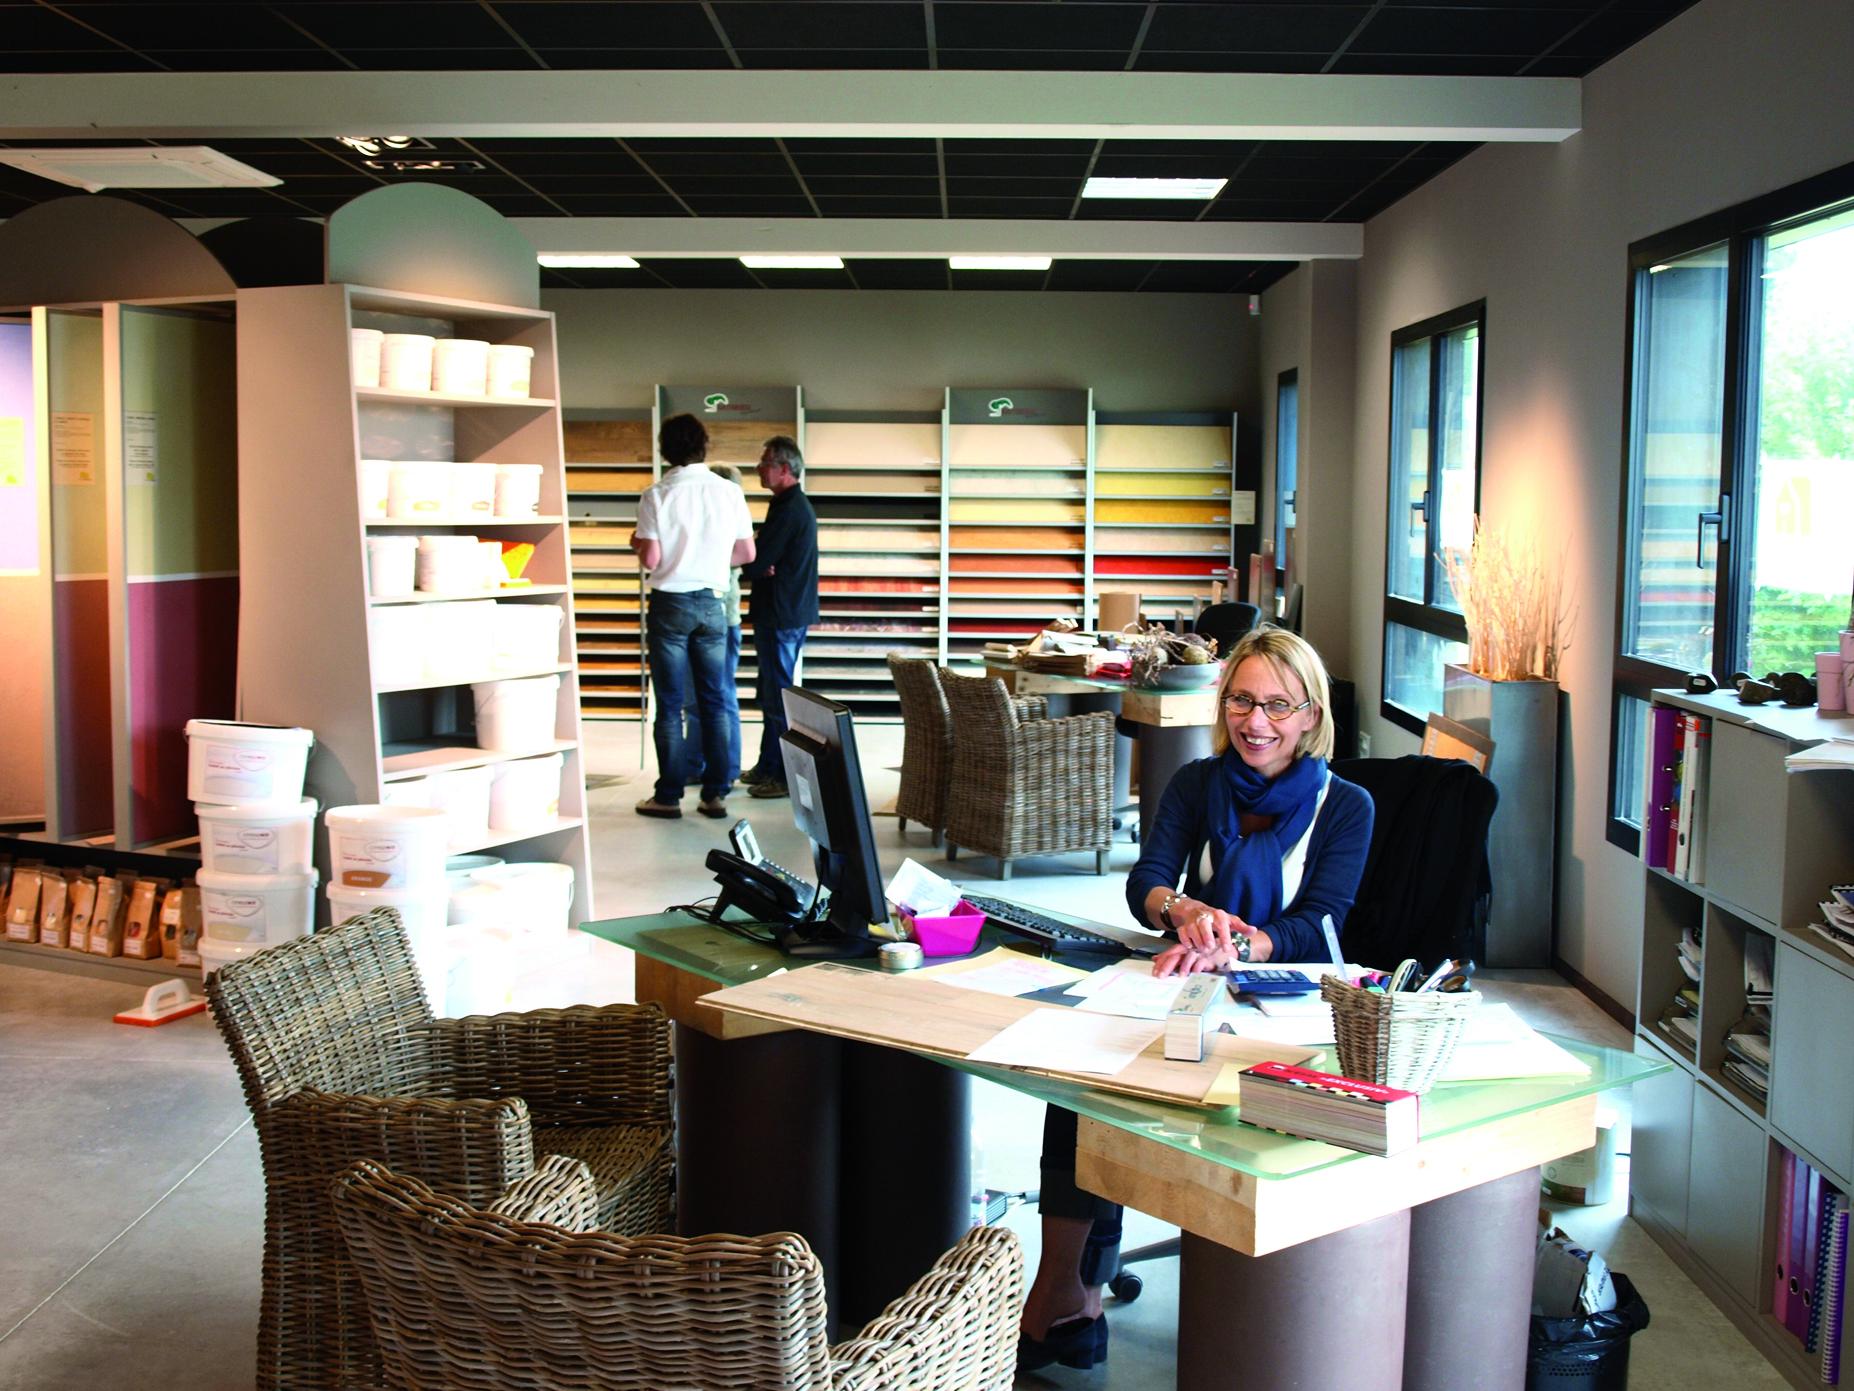 mat riaux naturels comptoir de l 39 est mat riaux naturels pour l 39 habitat alsace news. Black Bedroom Furniture Sets. Home Design Ideas